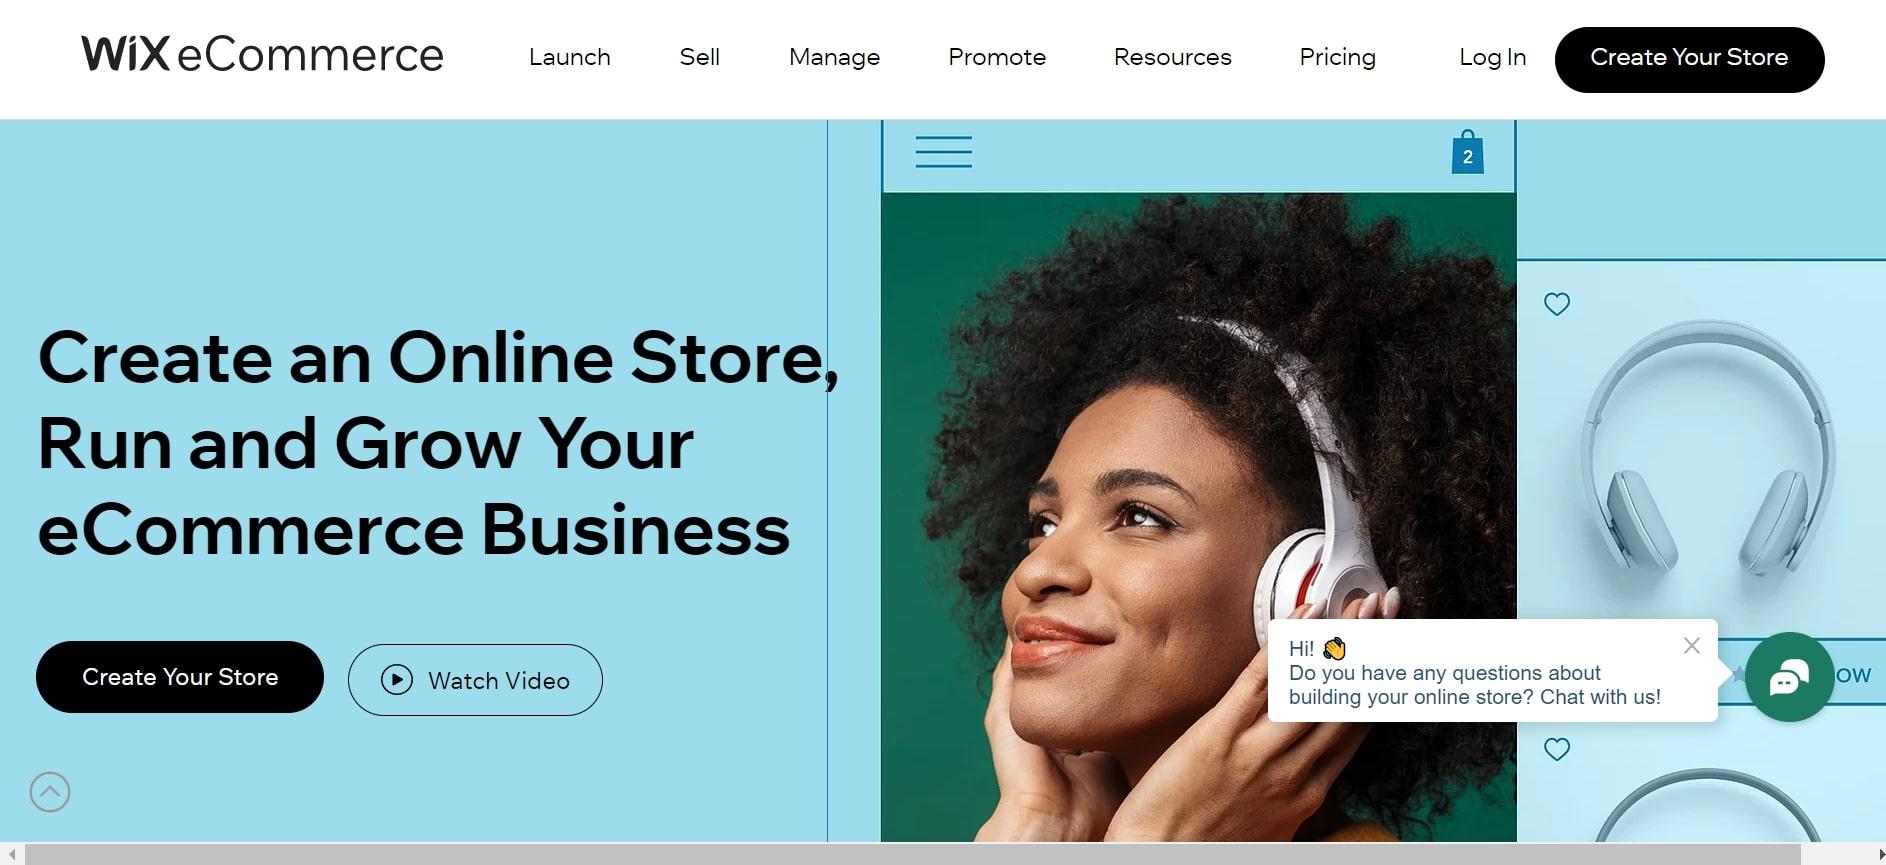 Wix eCommerce